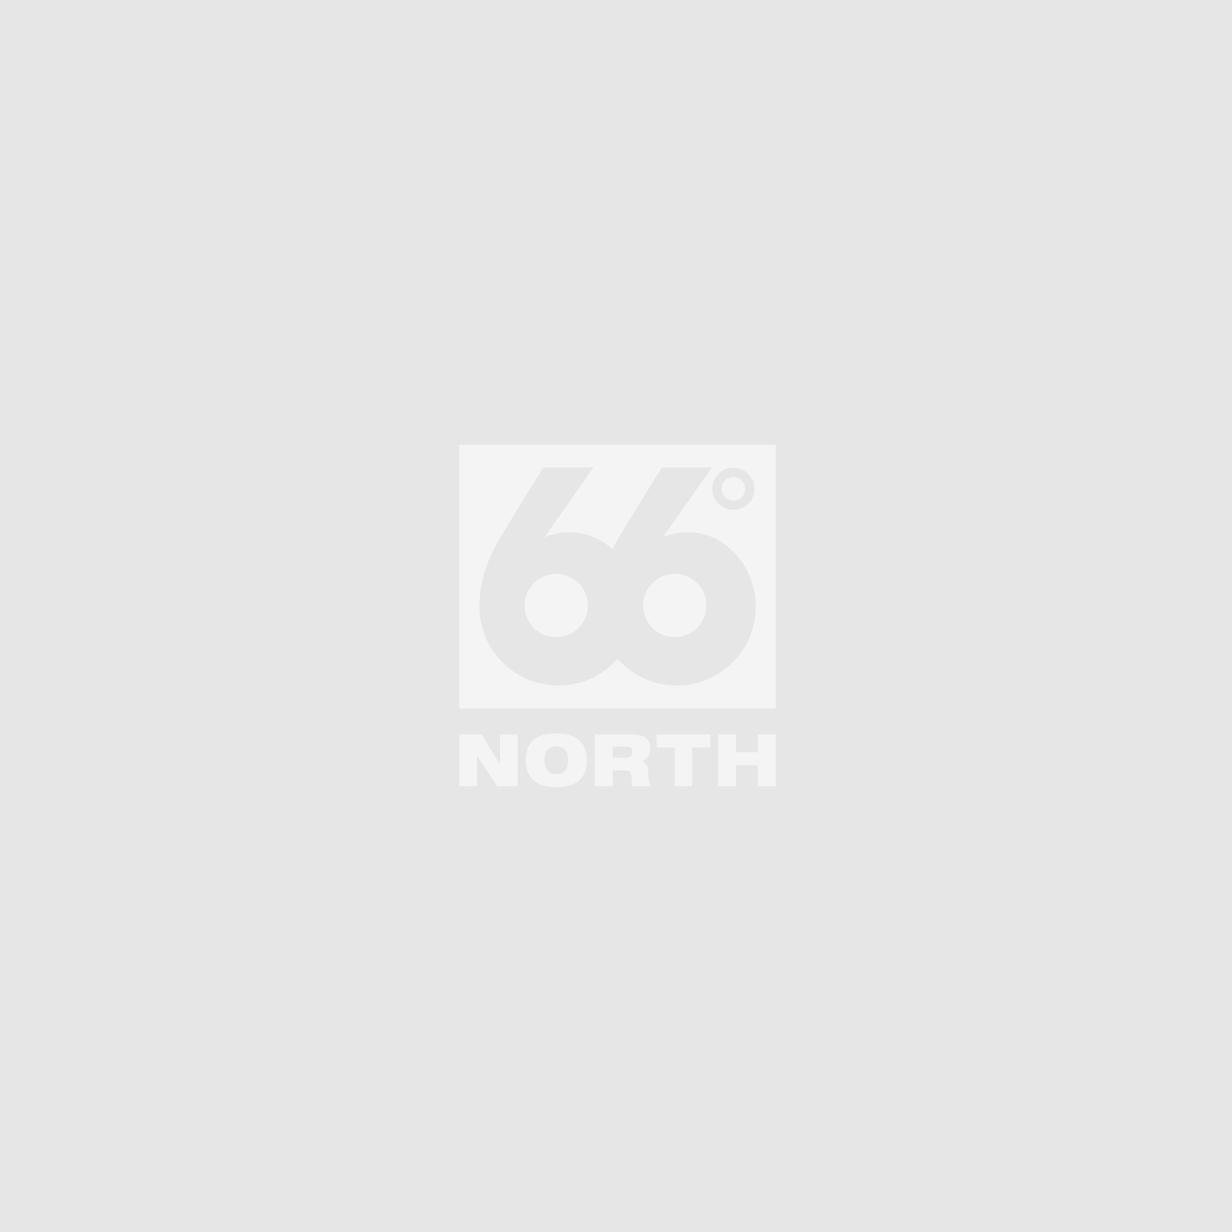 66 North Men's Borgir Bottoms - Black - S